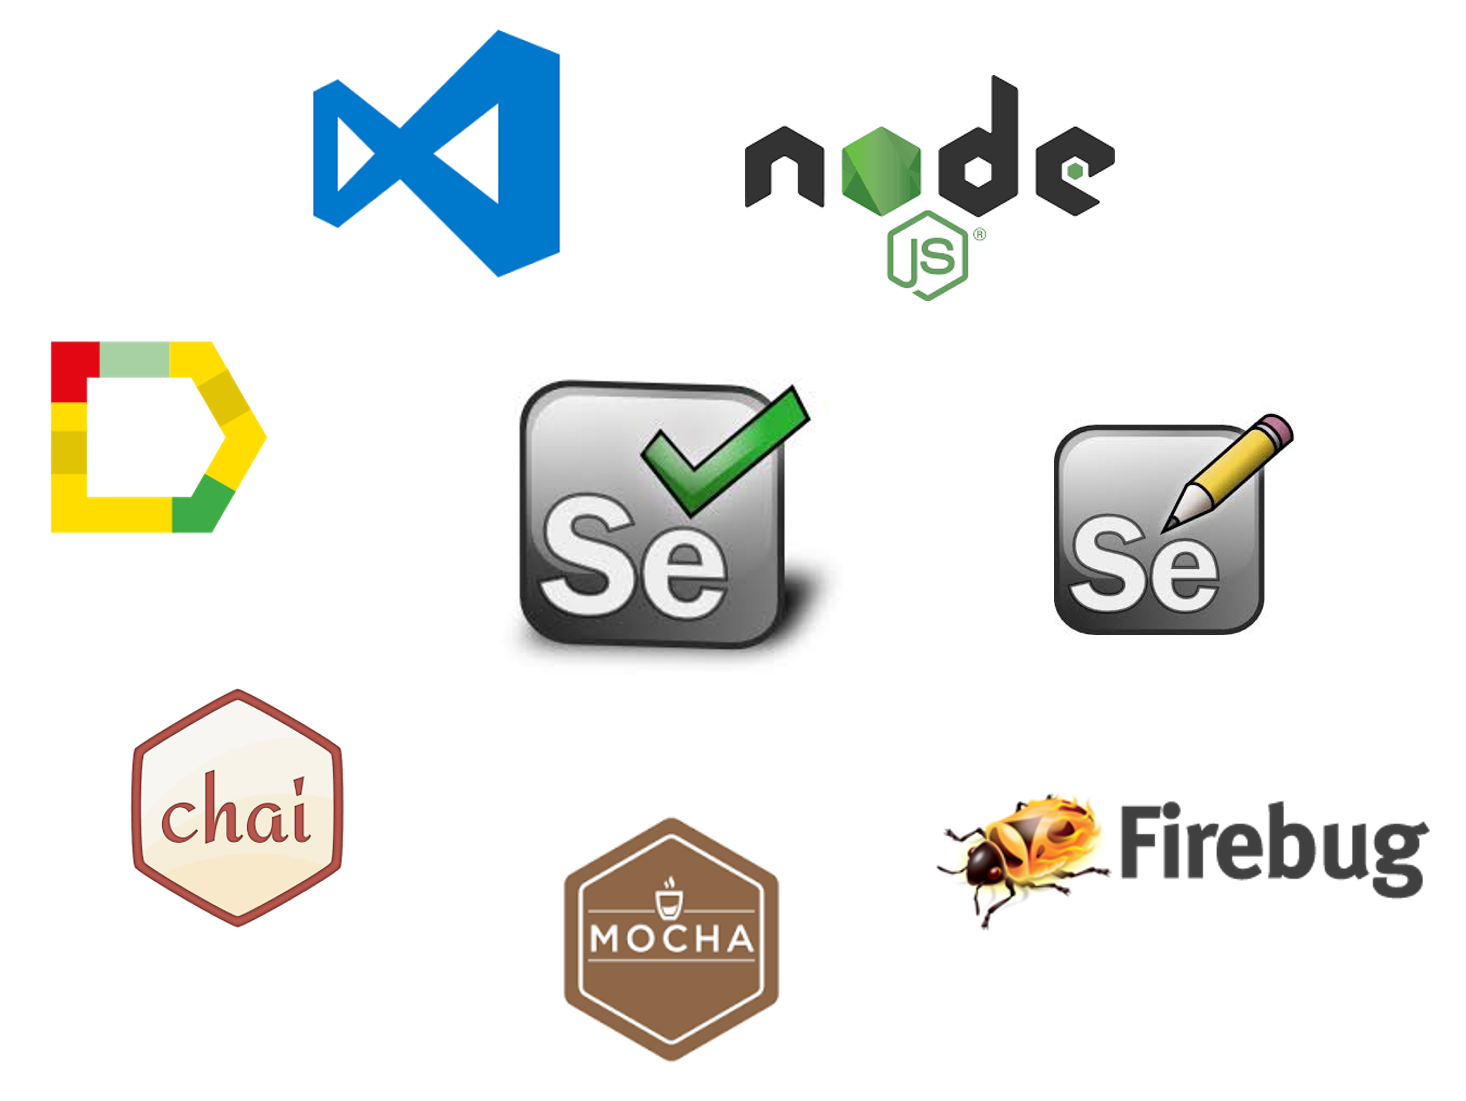 Setting Up a TestOps Environment Using Selenium WebDriver